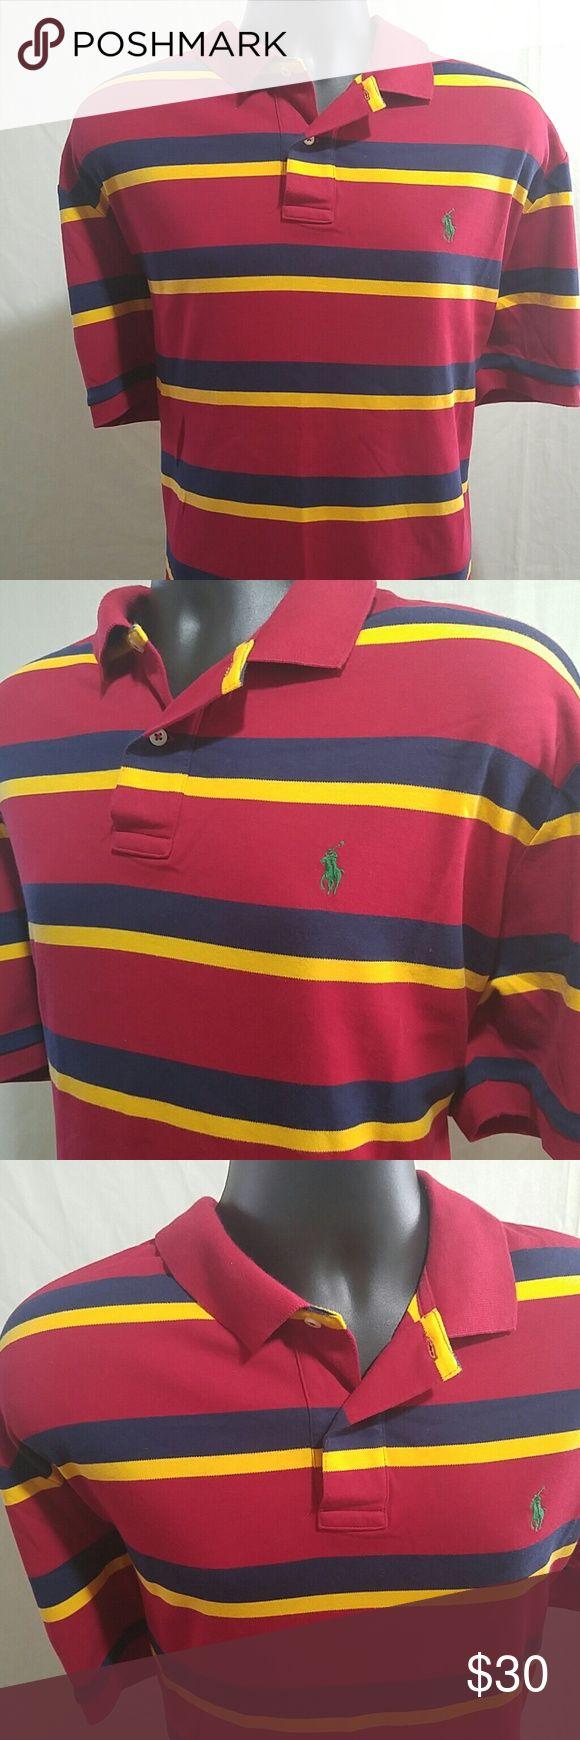 POLO BY RALPH LAUREN Shirt Size XL Striped POLO BY RALPH LAUREN Shirt.  This is a sleeve bold striped shirt sleeve shirt.  This shirt is a size XL.  This POLO BY RALPH LAUREN Shirt is in excellent like new condition. Polo by Ralph Lauren Shirts Polos